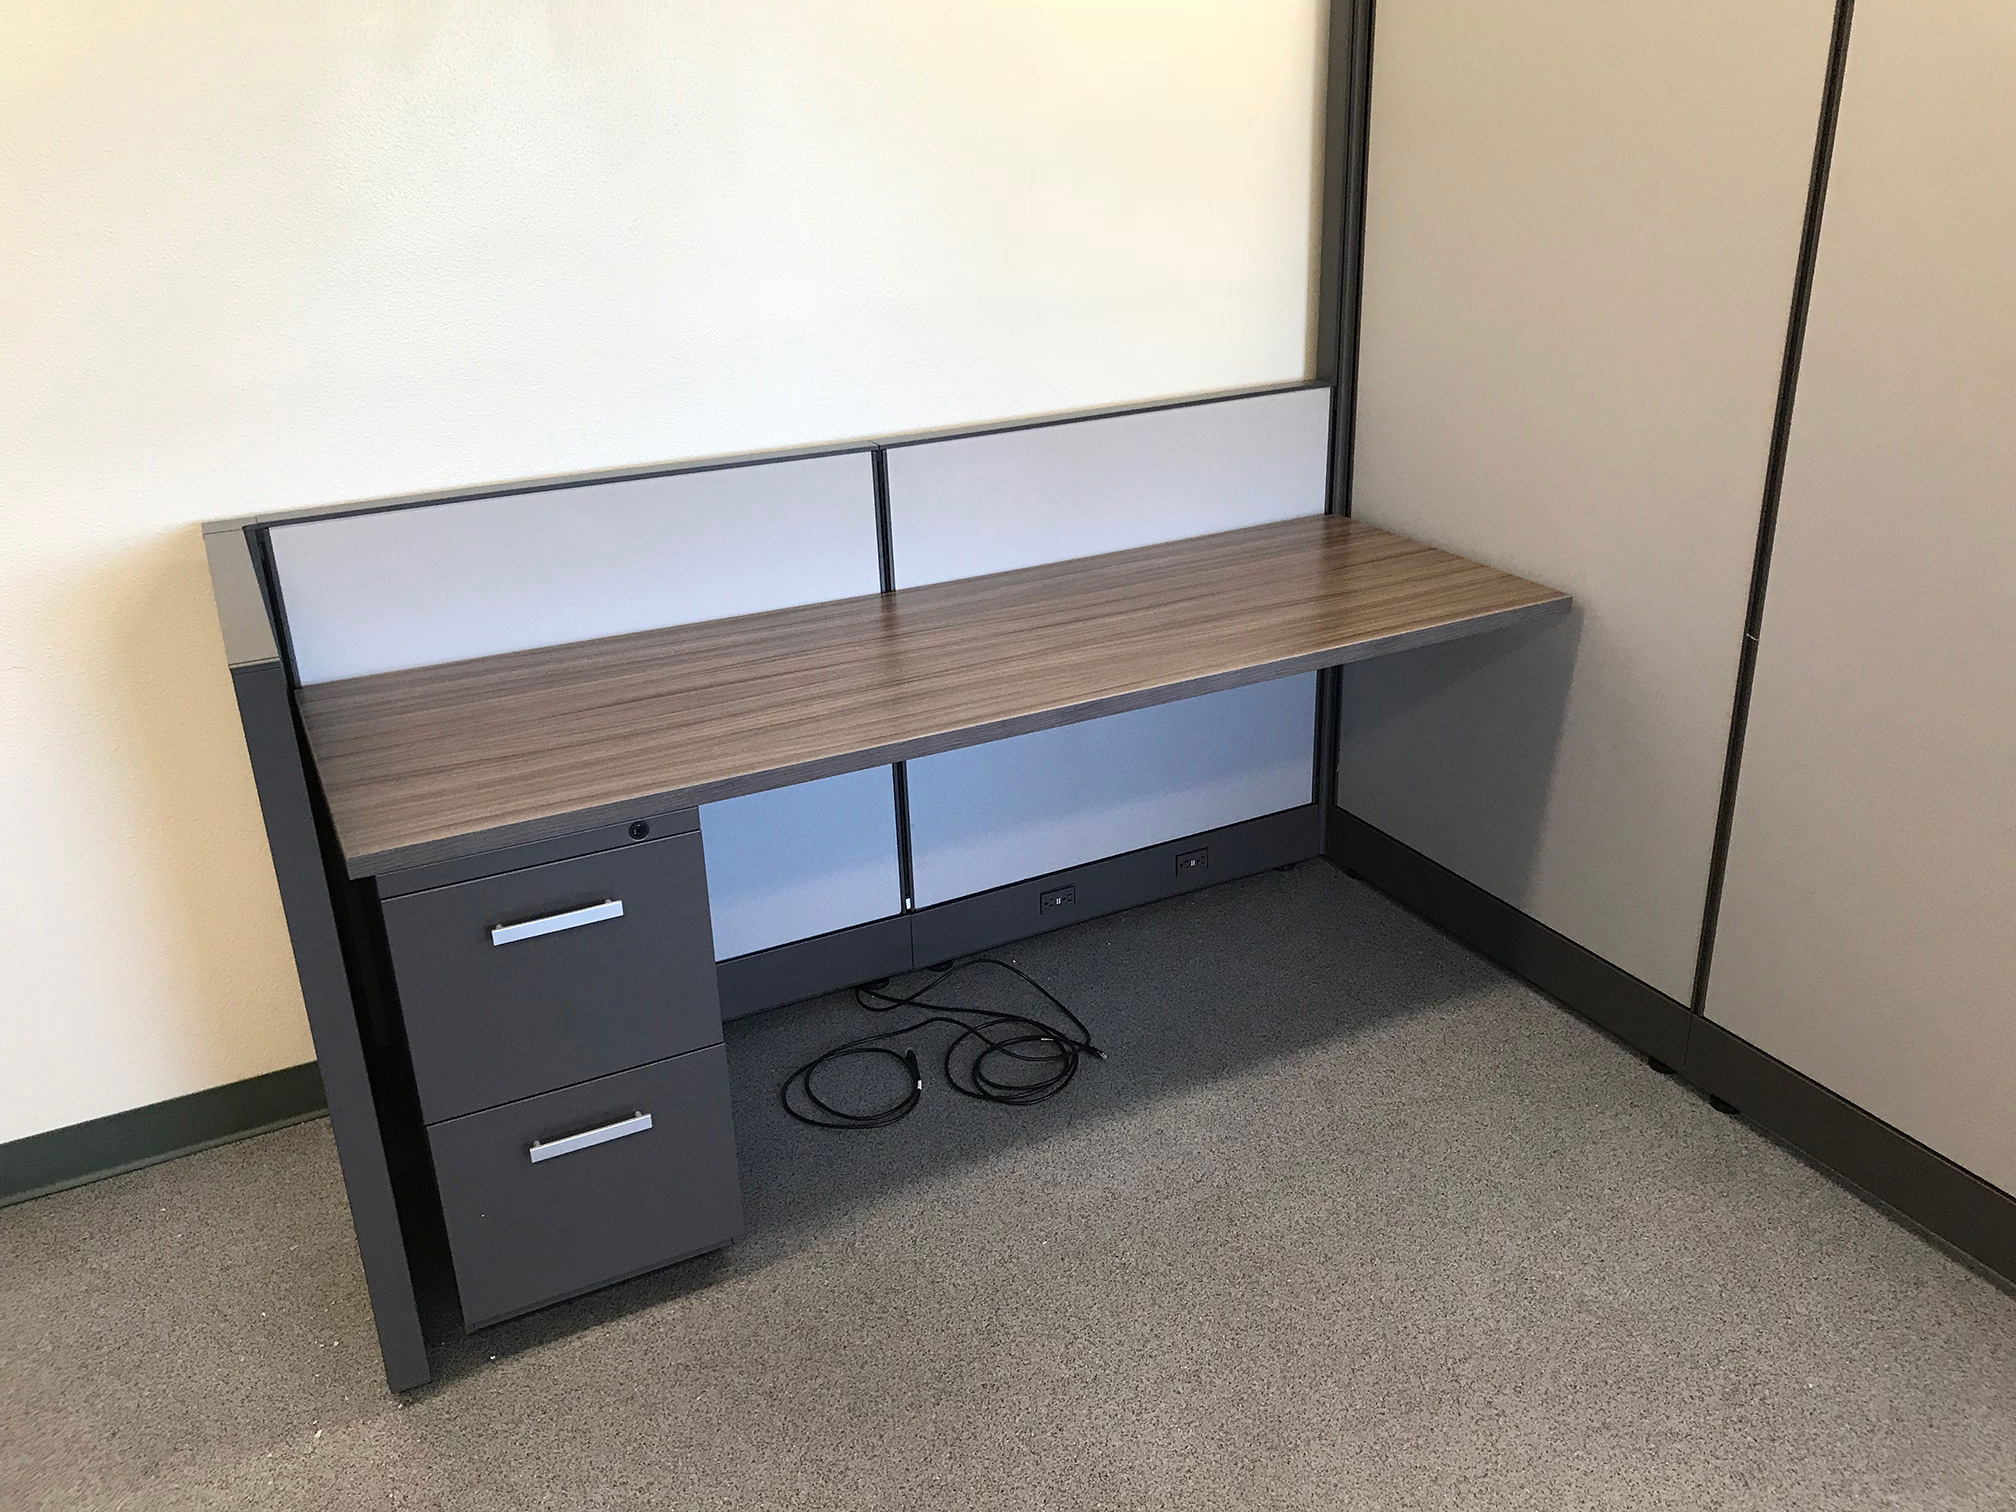 office-cubicles-for-sale-in-bradenton-florida-3-2.jpg